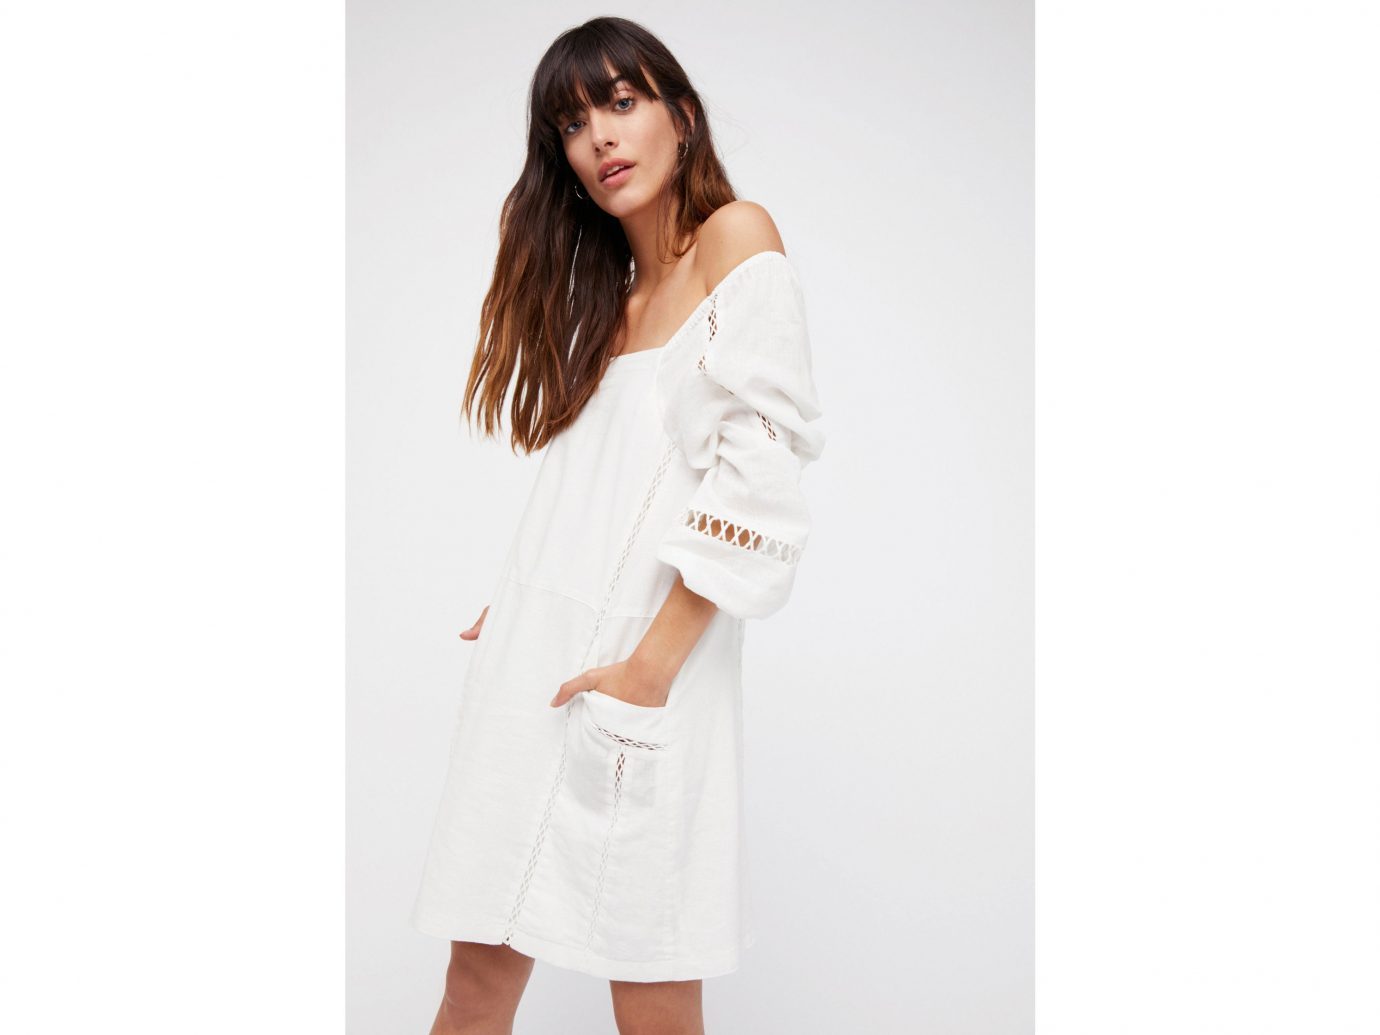 Cruise Travel Style + Design clothing white person sleeve t shirt dress outerwear posing photo shoot neck blouse abdomen pocket textile beige collar dressed